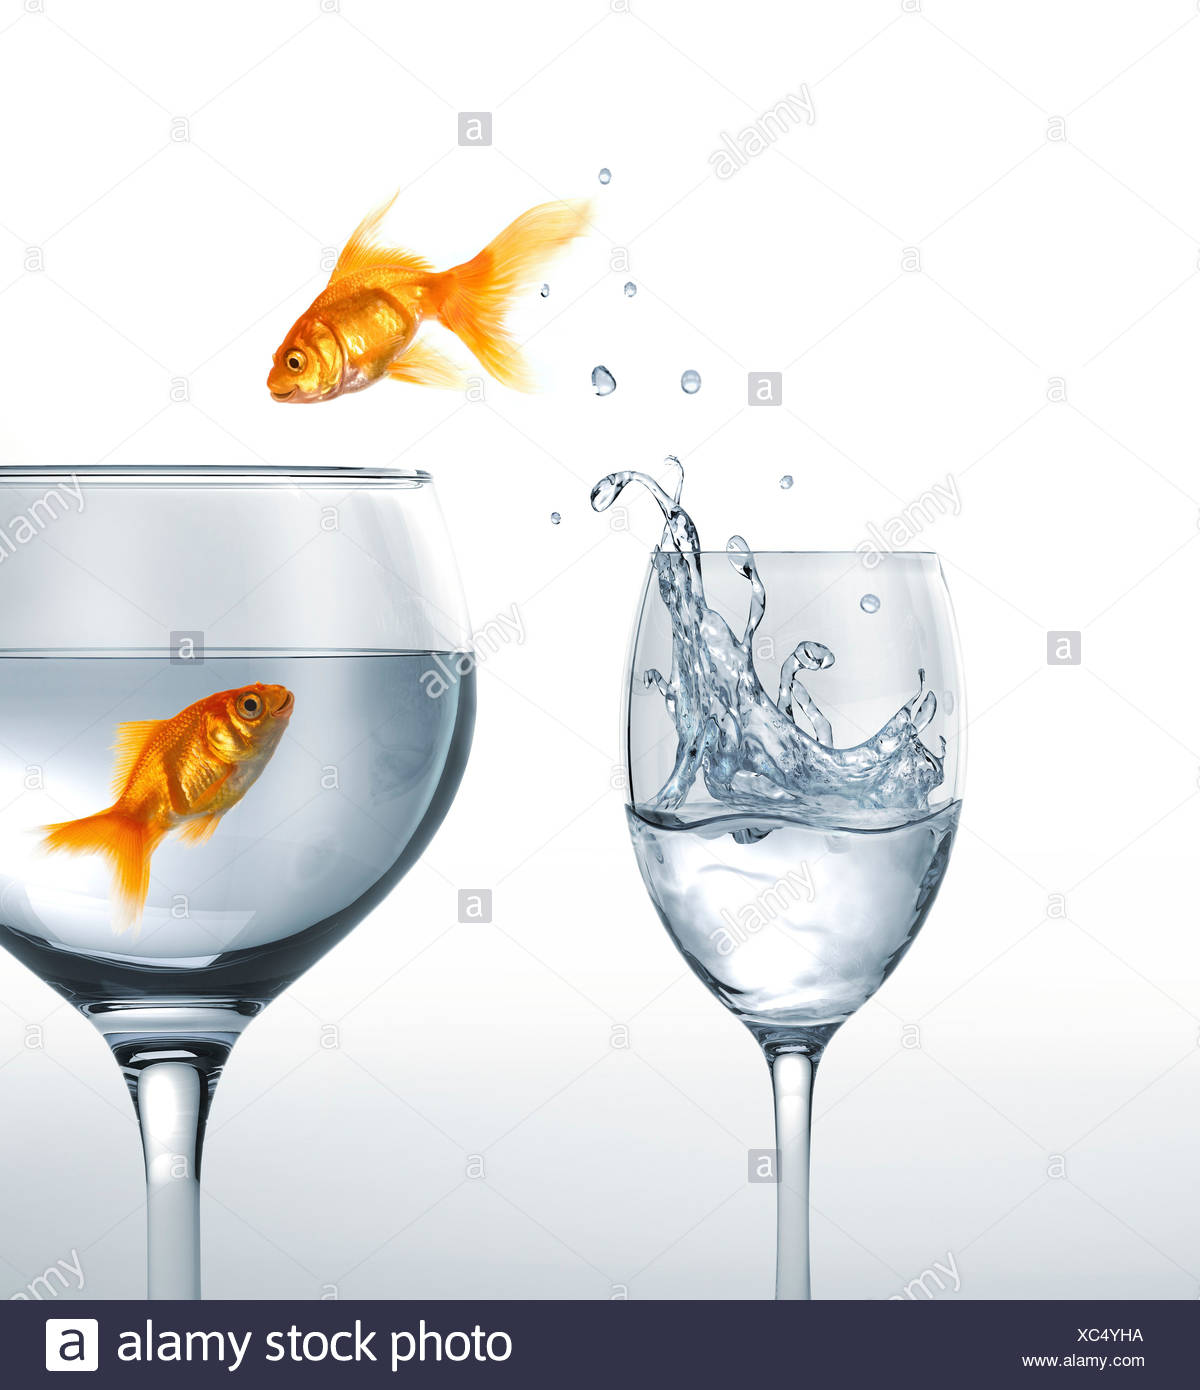 Jumping goldfish artwork Immagini Stock